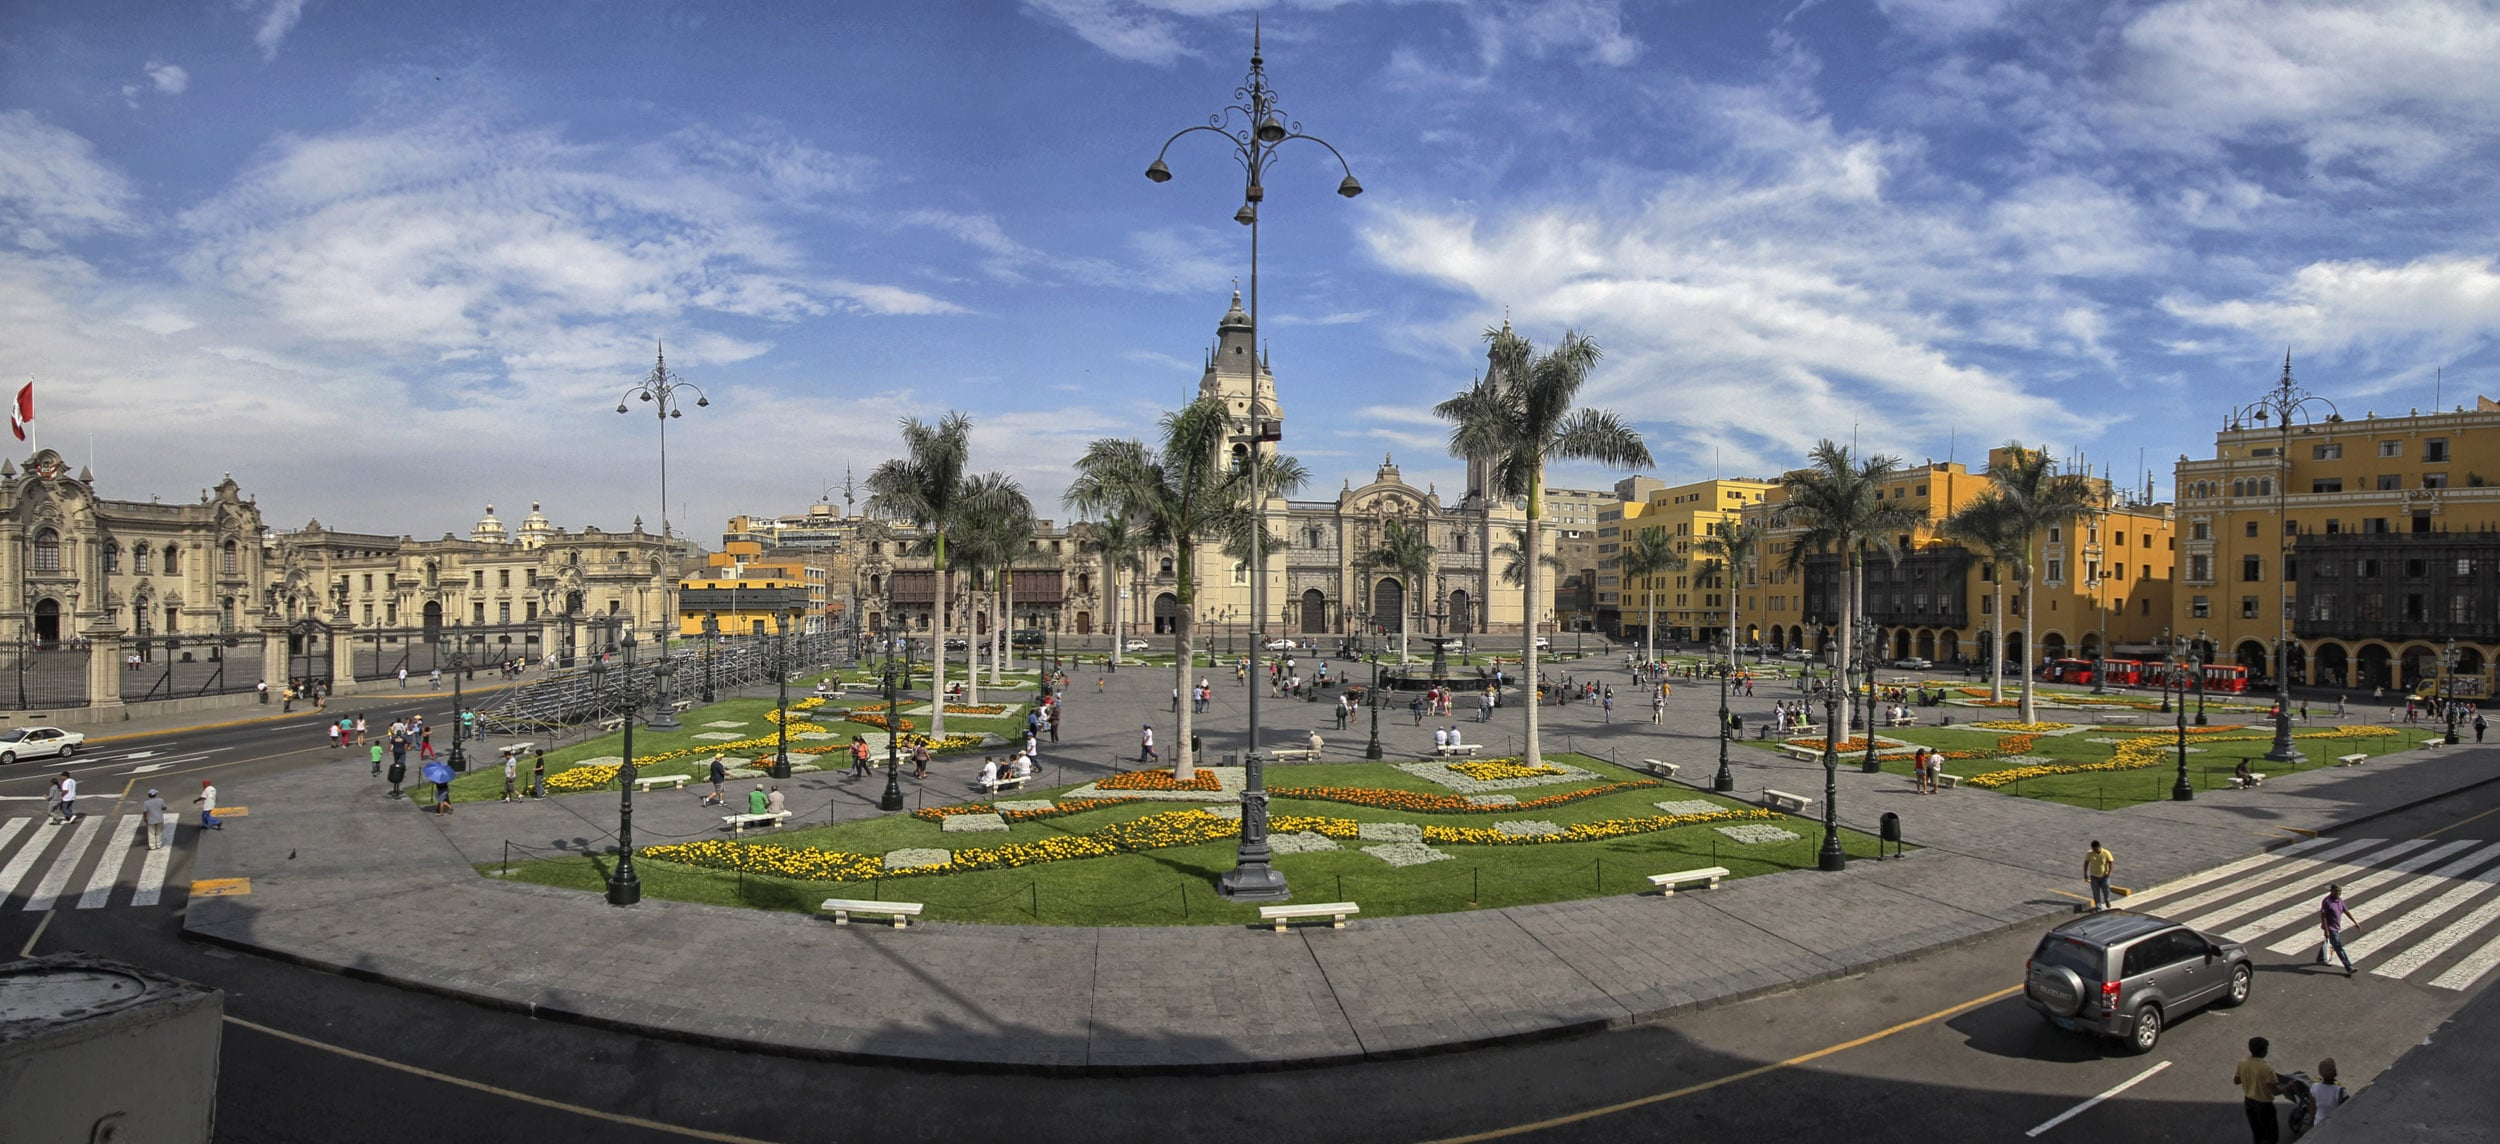 Plaza de Armas, a UNESCO World Heritage Site in Lima